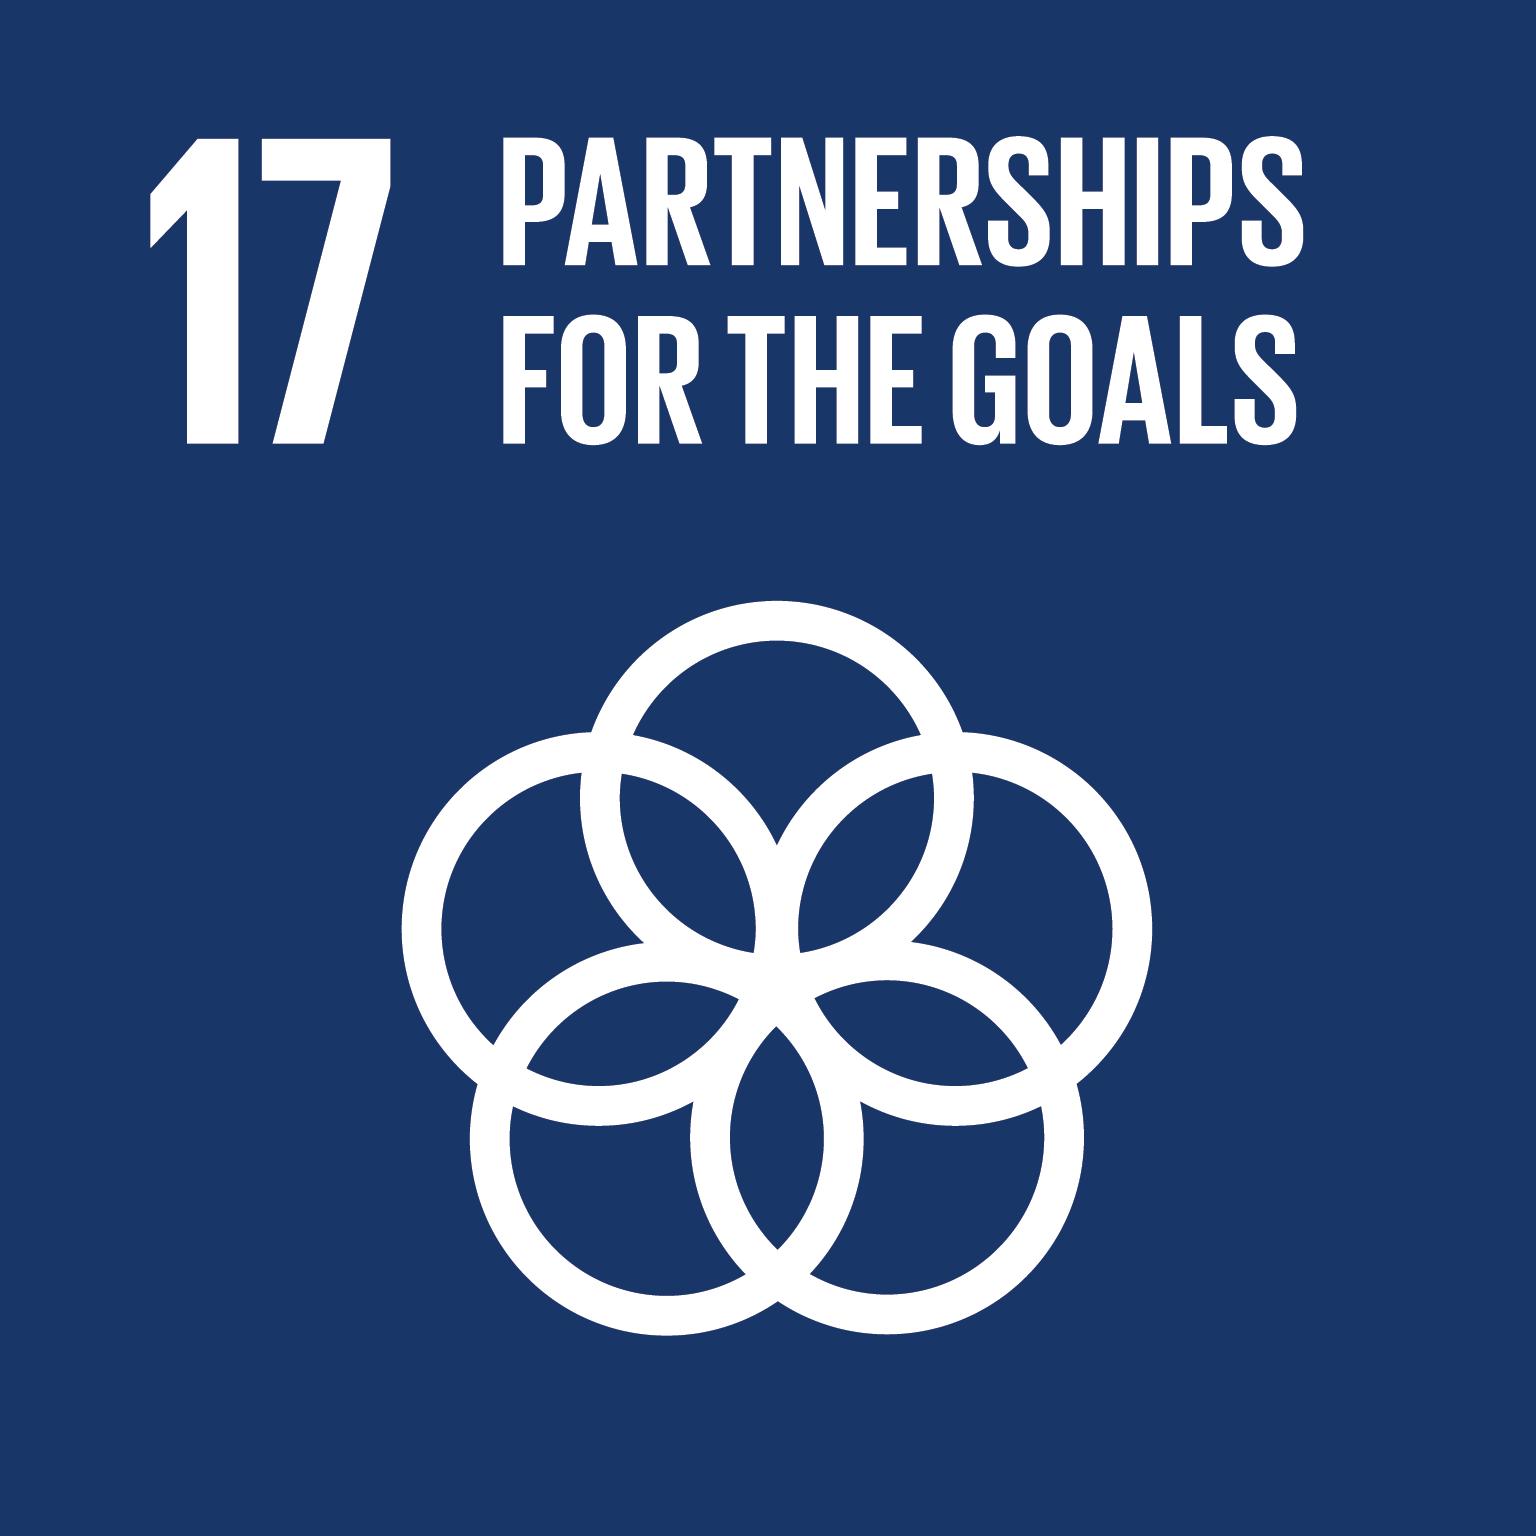 UN SDG 17 Partnerships for the goals